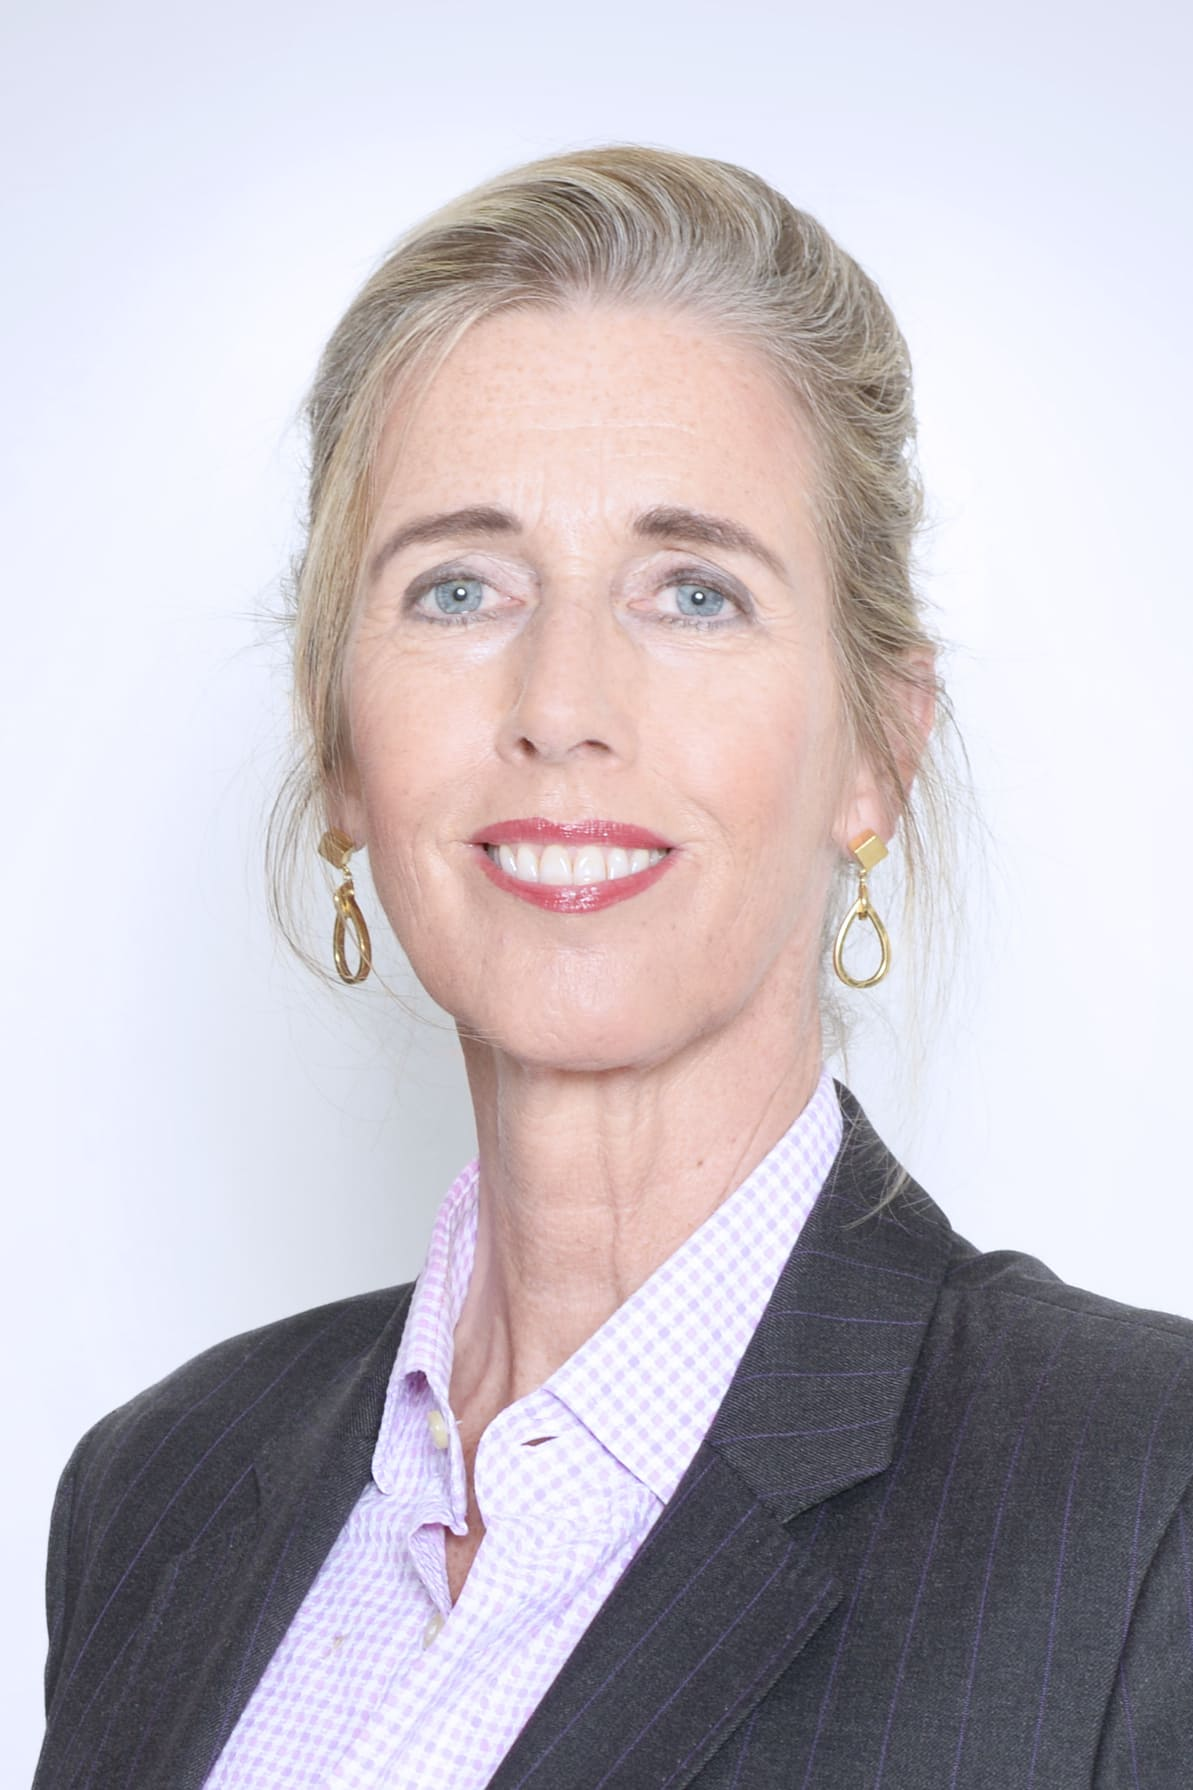 Personalberaterin udn Geschäftsführerin Bianca Overbeck